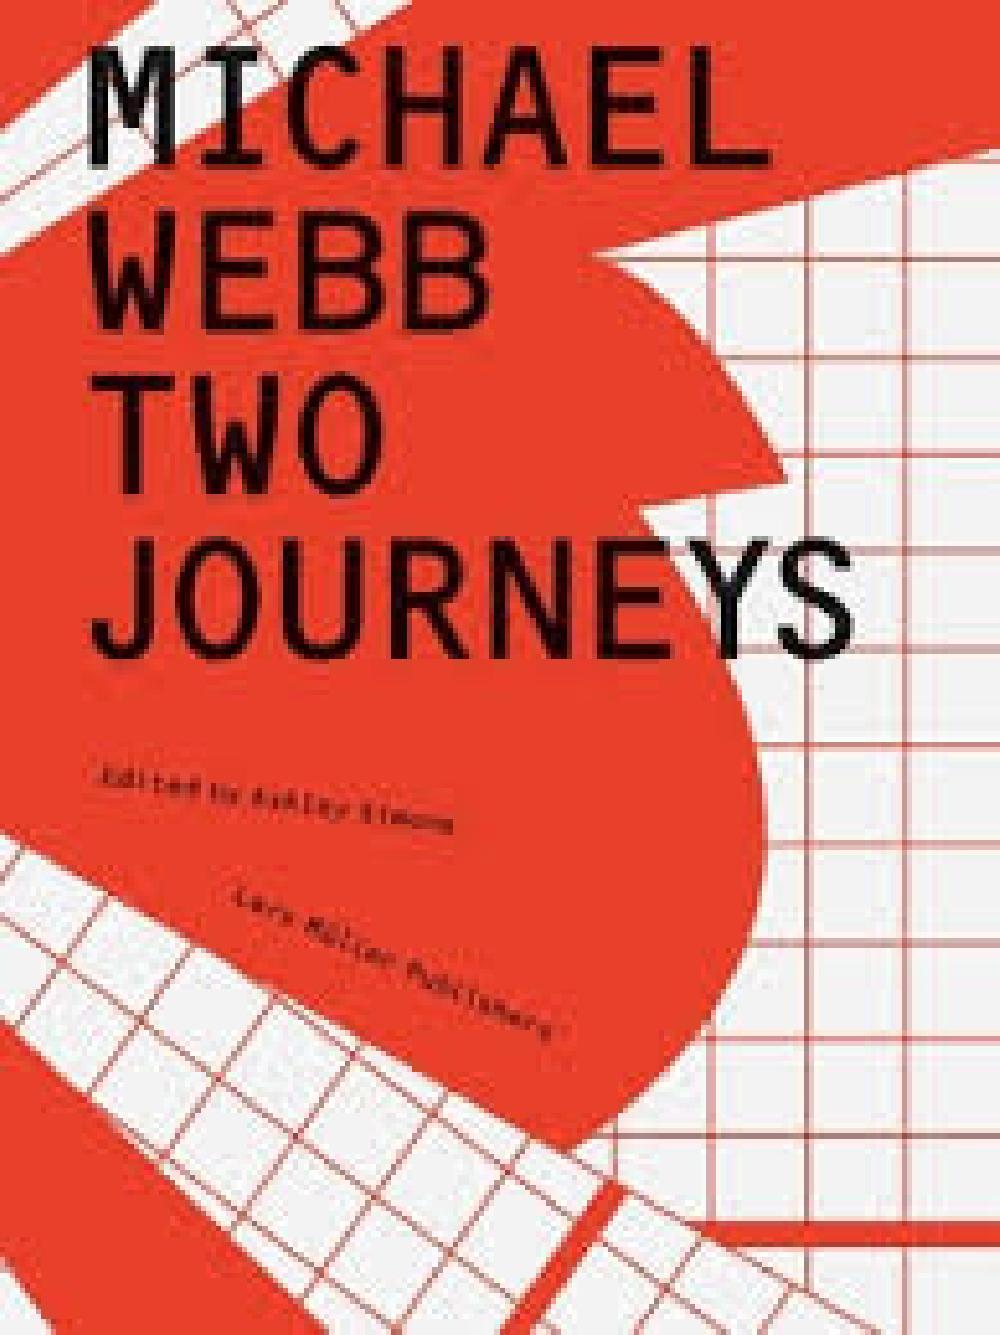 Michael Webb Two Journeys